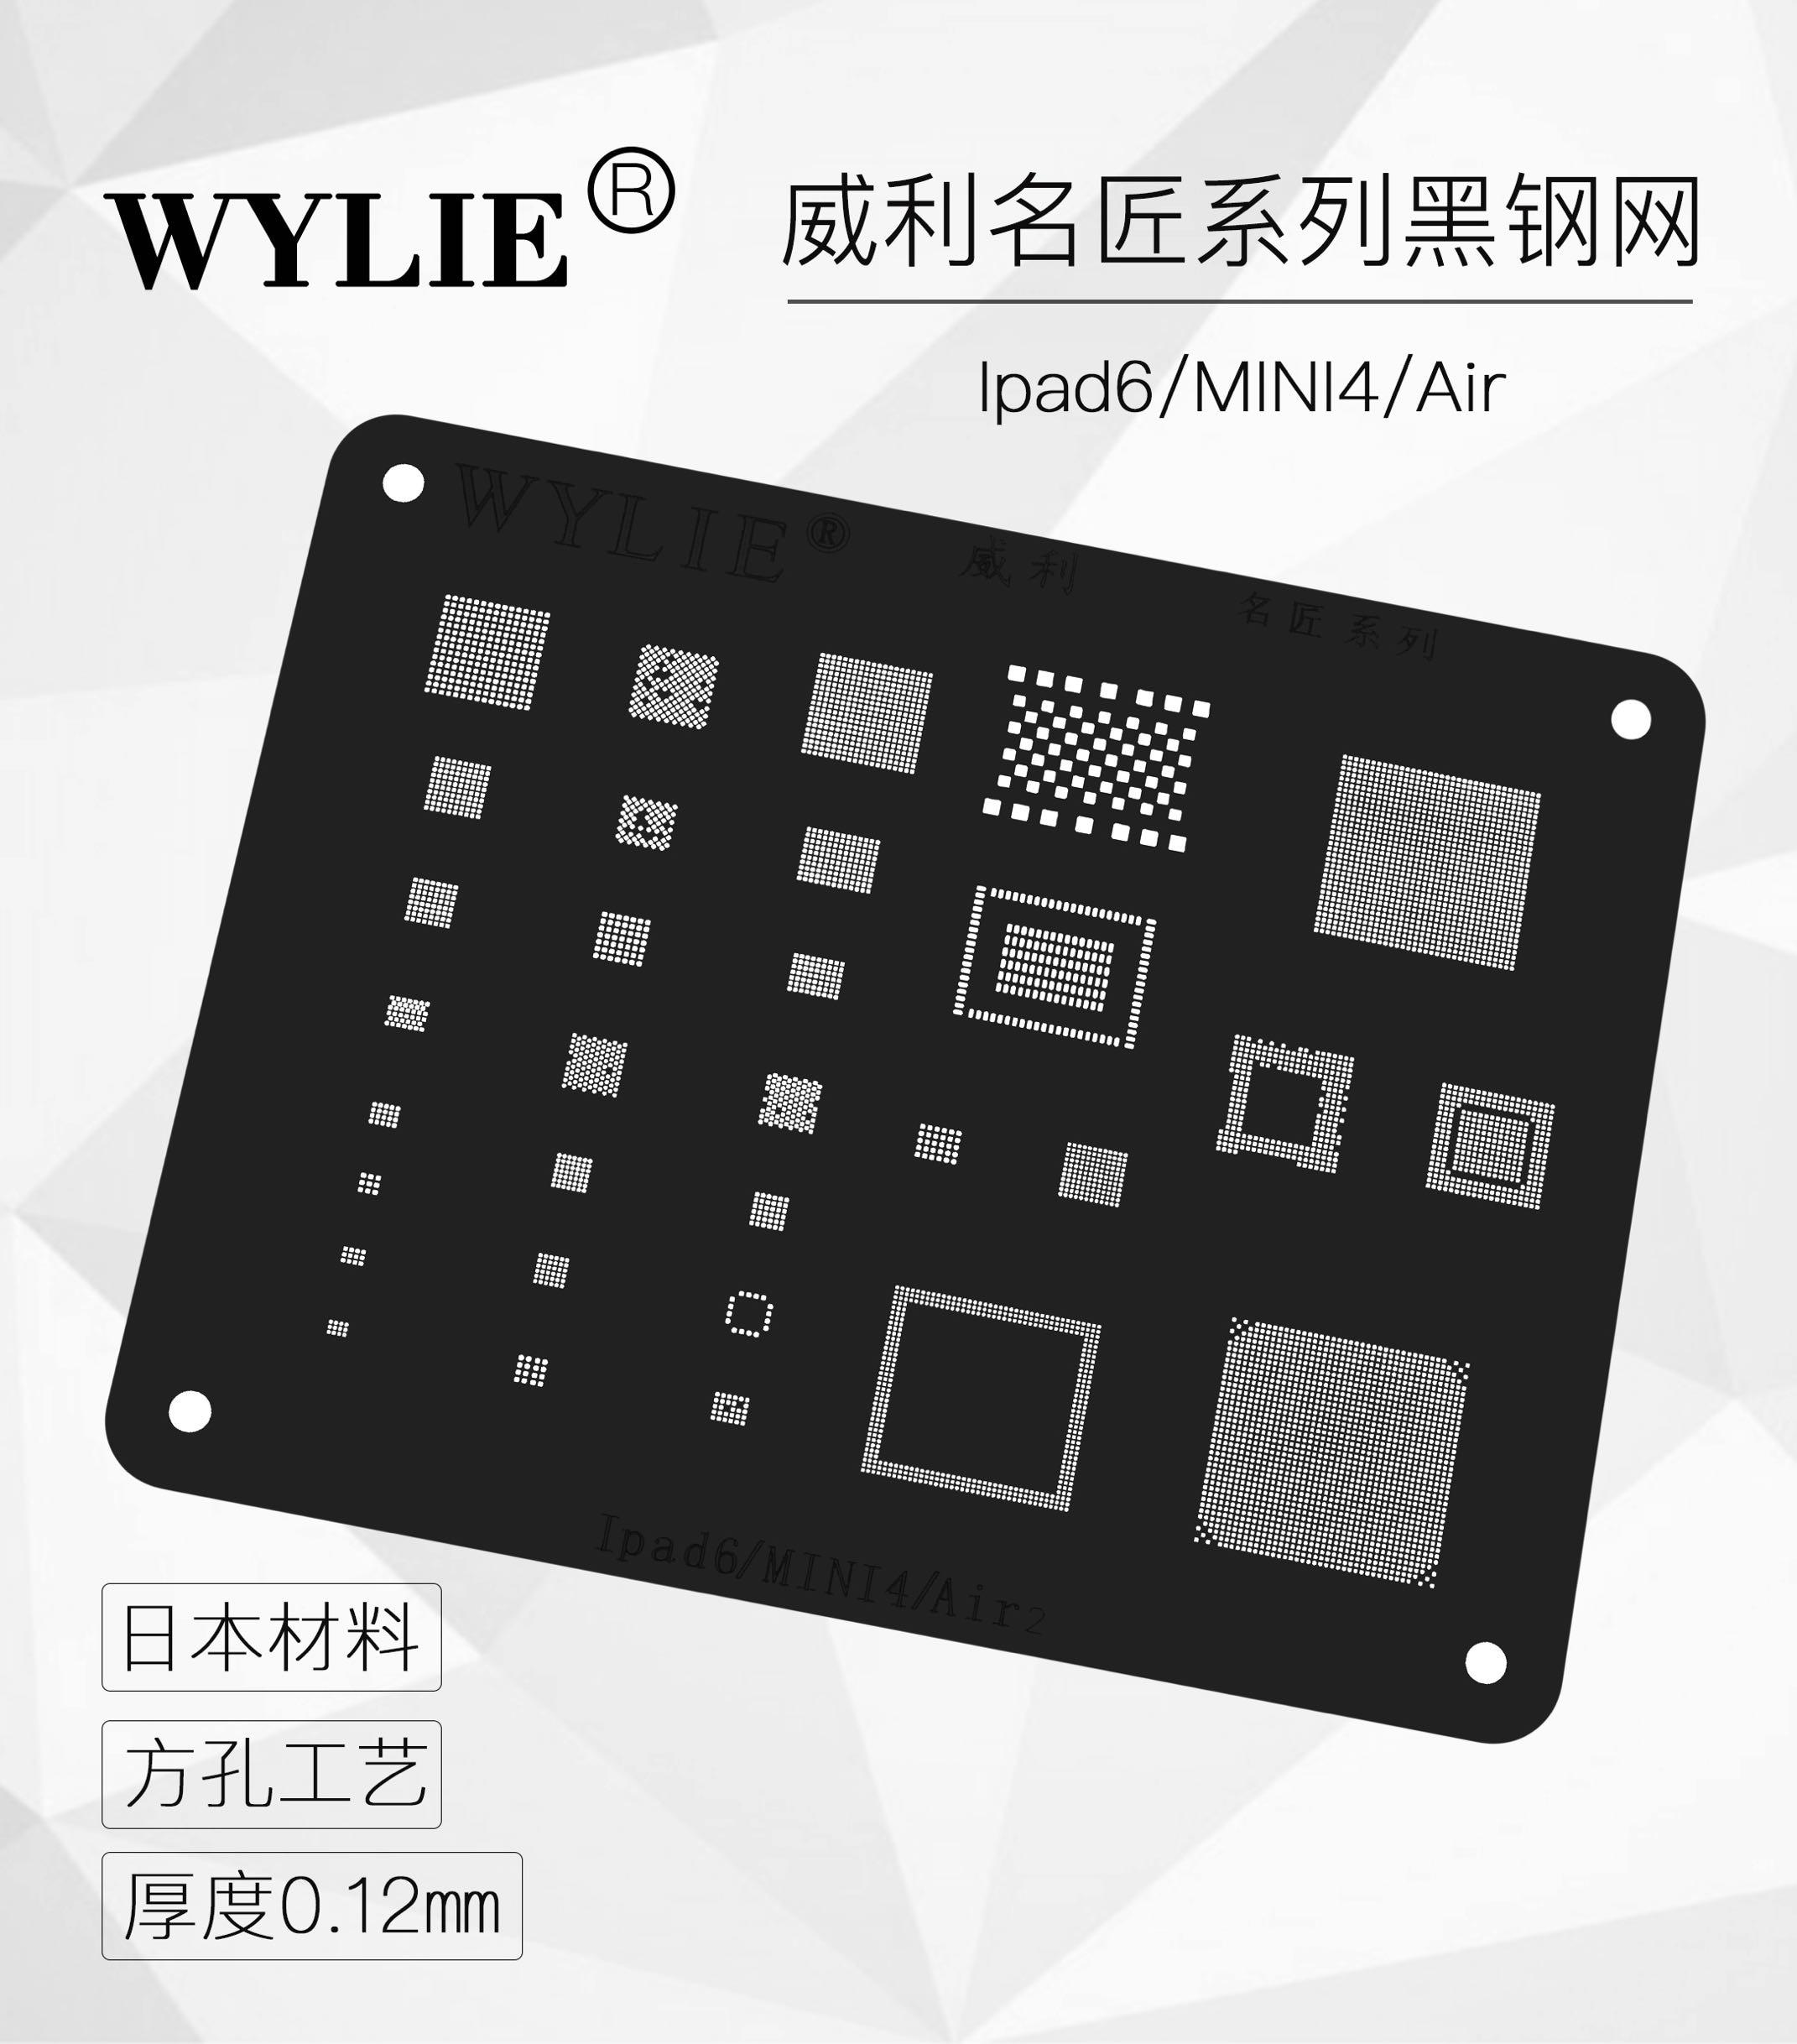 Wylie BGA Reballing Stencil for  ipad 6 Air2 5 Air 4 3 2 mini pro 12.9 10.5 9.7 IC Chip Power U2 NAND PCIE 4